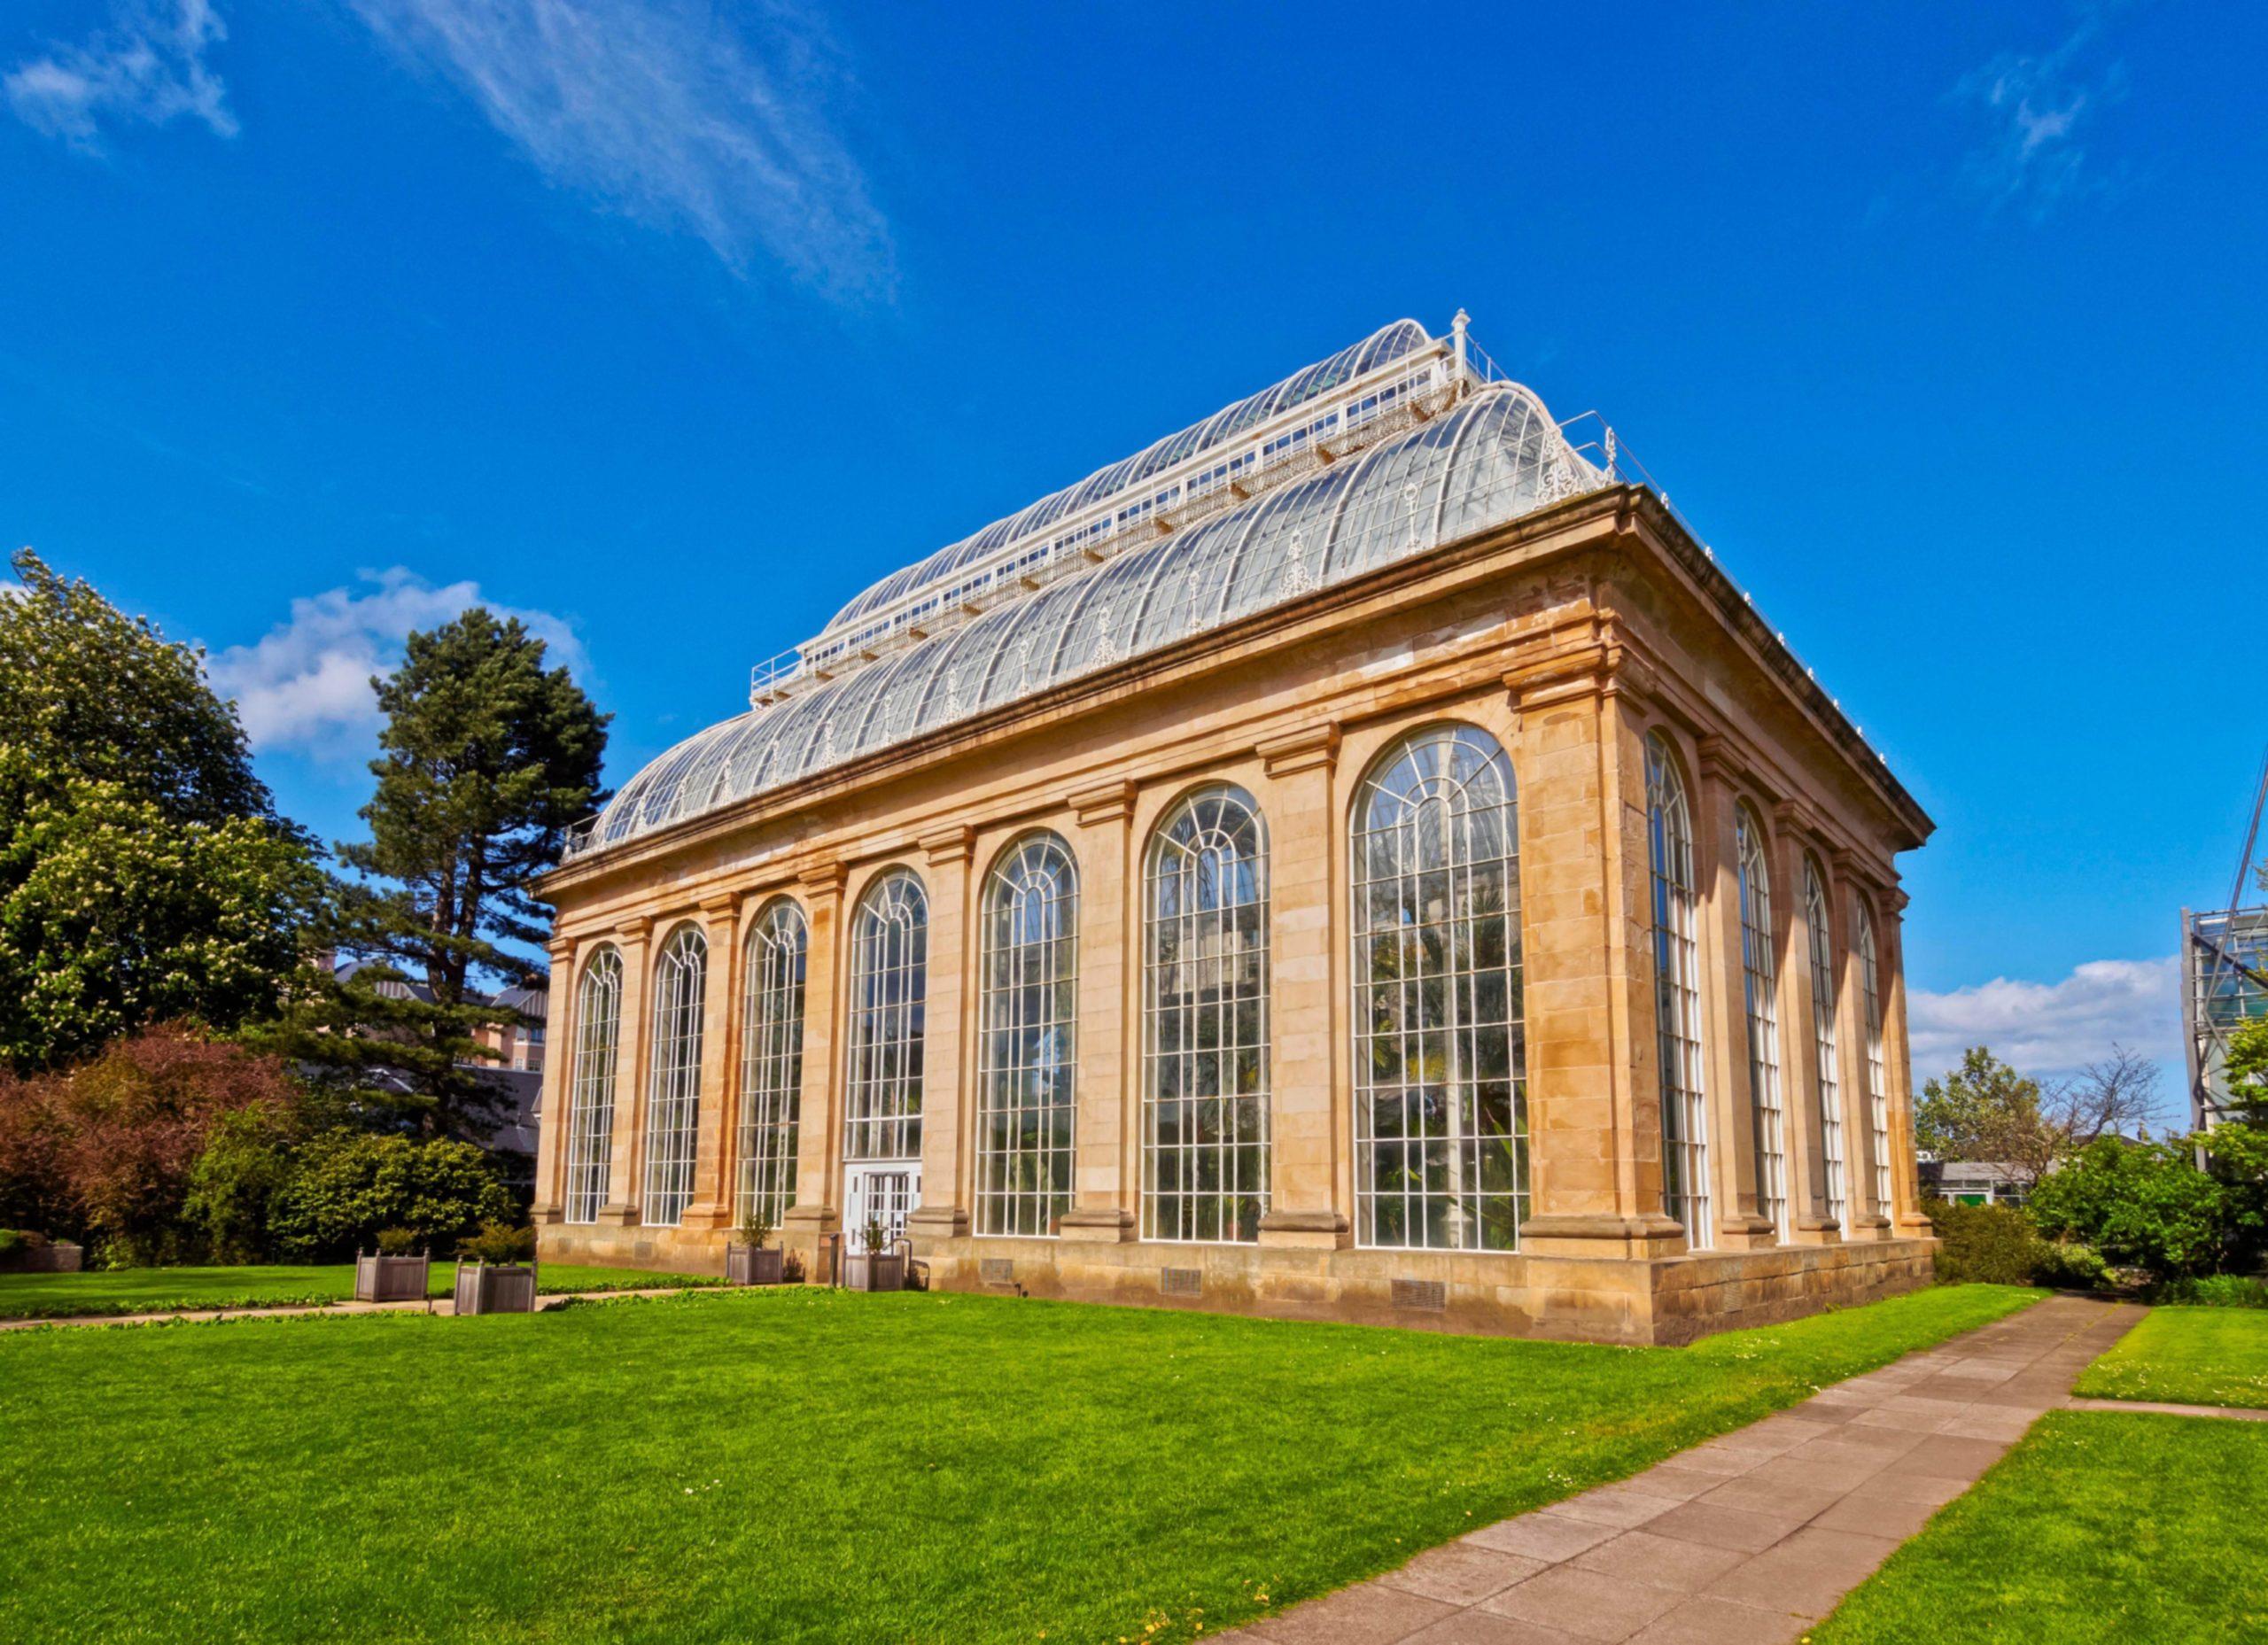 Royal Botanic Garden Edinburgh's Temperate Palm House, home to exotic plants